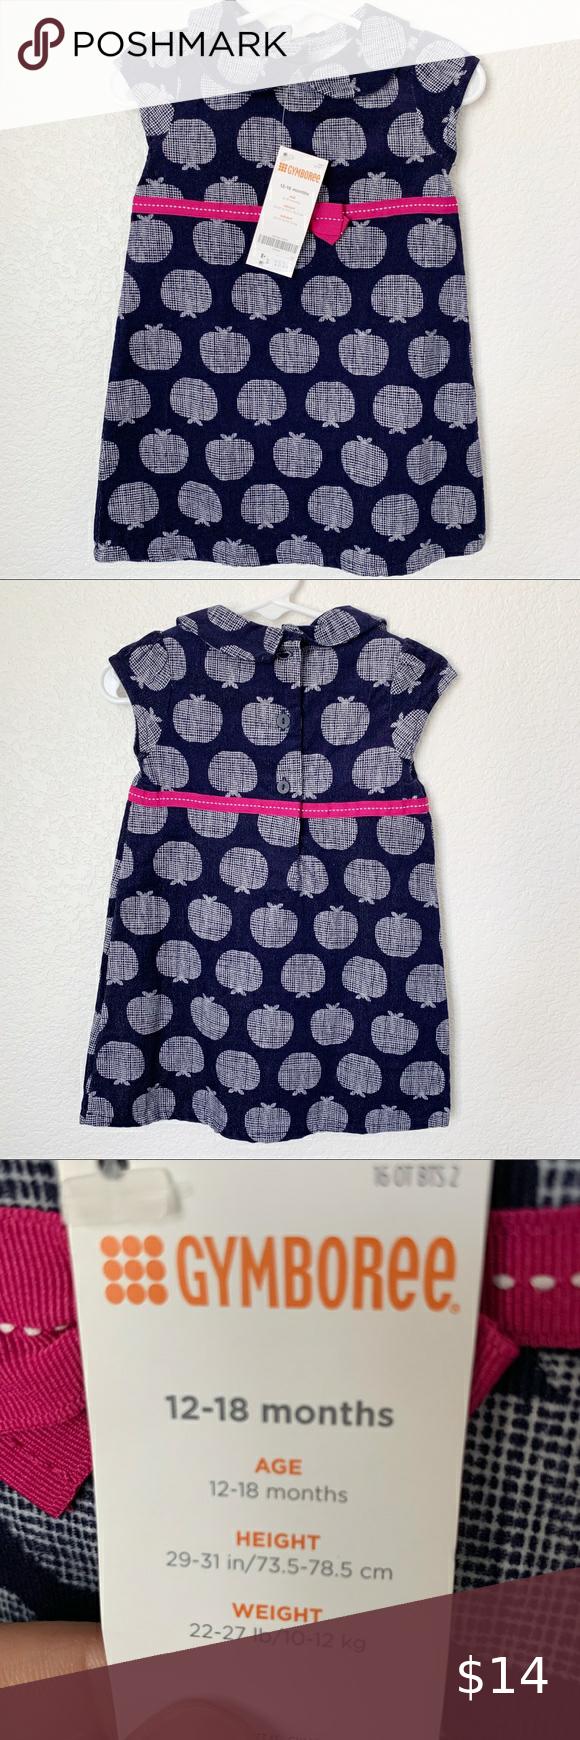 NEW Gymboree Girls Charm Class Apple Print Corduroy Dress NWT Size 6-12M